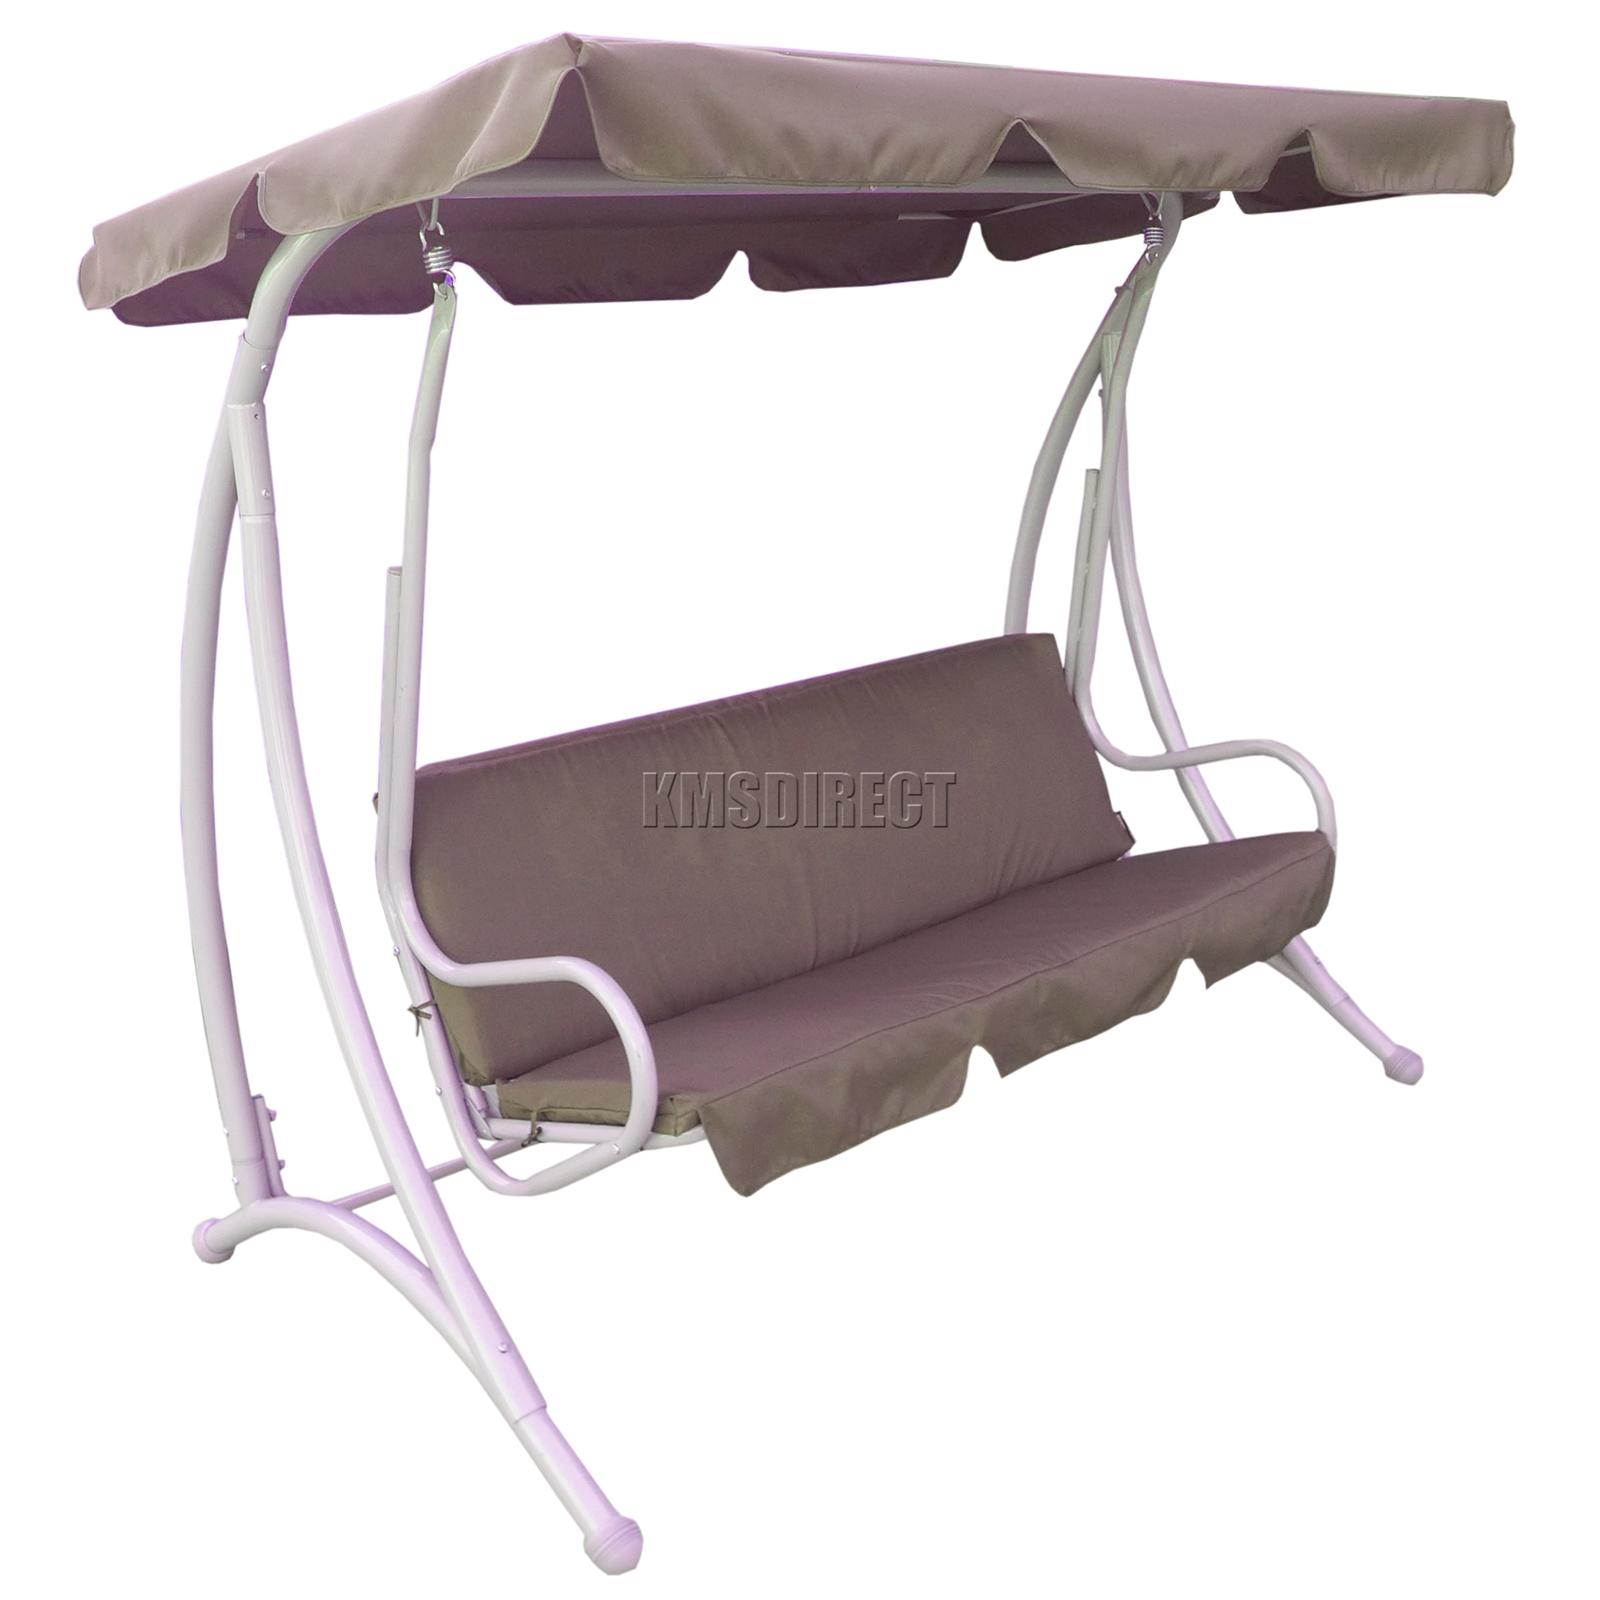 Foxhunter Fhsc02 Garden Swing Hammock 3 Seater Chair Bench Outdoor Canopy Brown Ebay